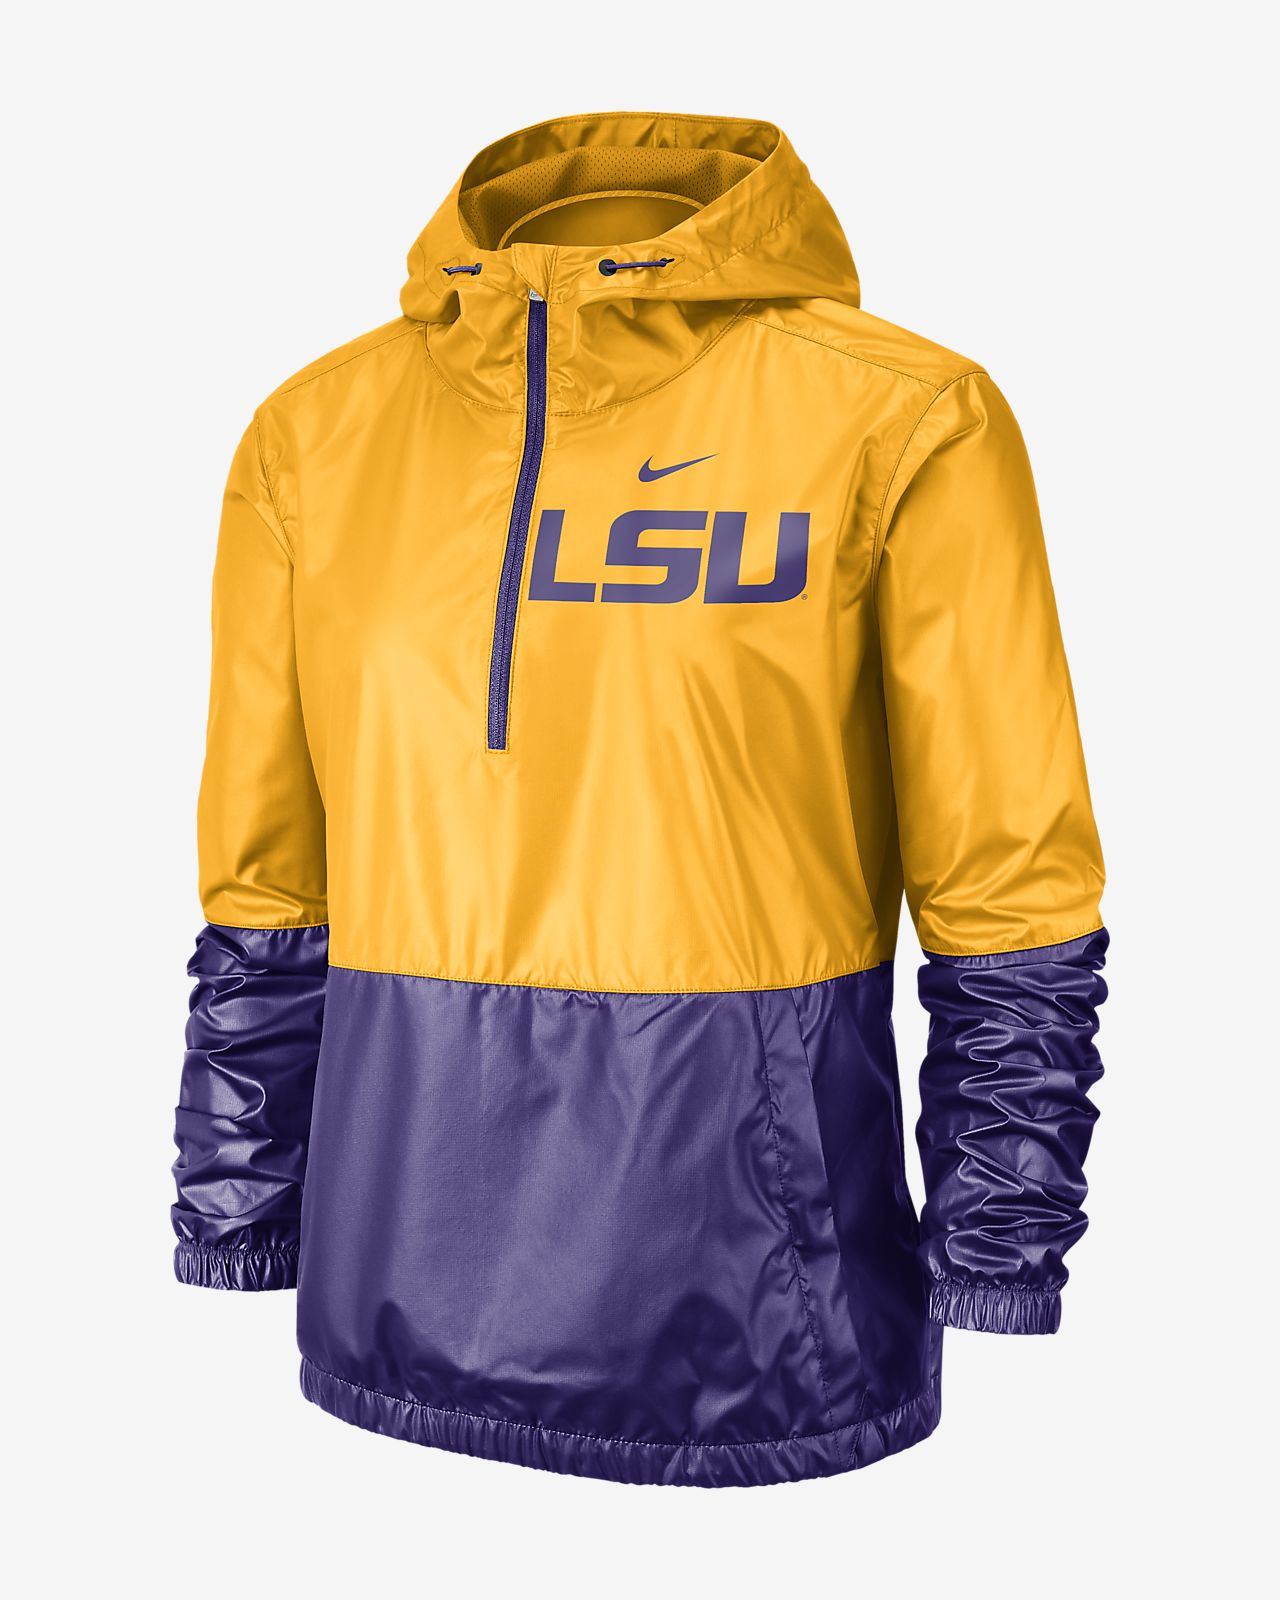 Nike College Anorak (LSU) Women's Jacket